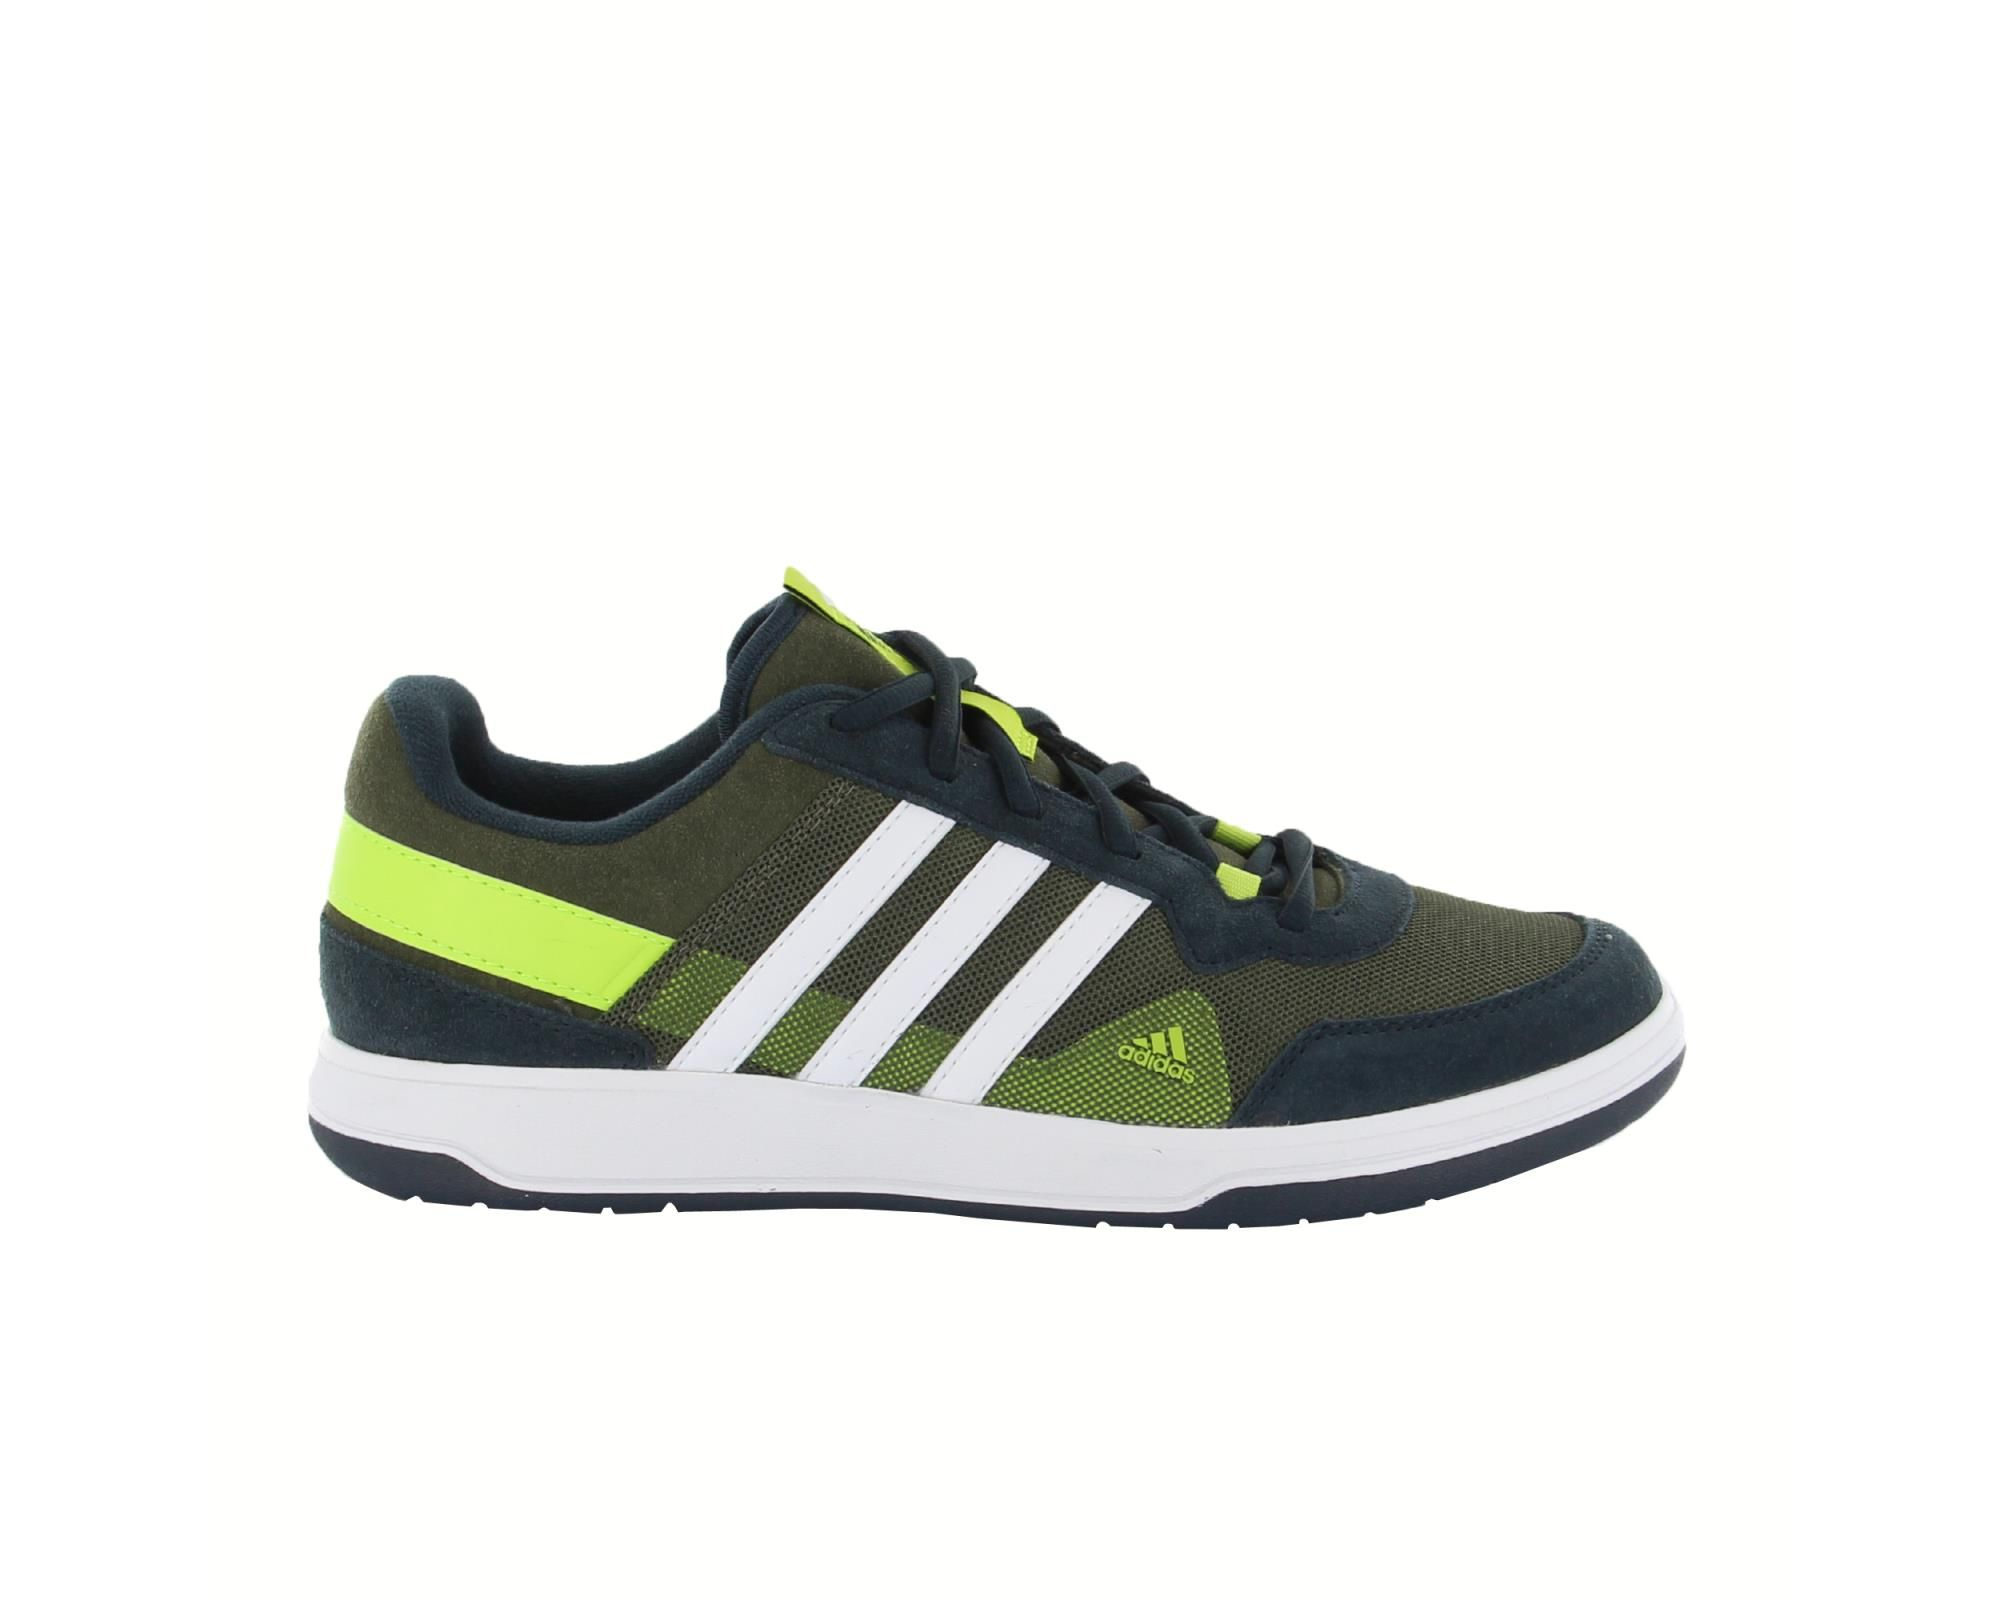 d66762_1_b http://www.korayspor.com/adidas-ayakkabi-gunluk-barricadence-8-d66762